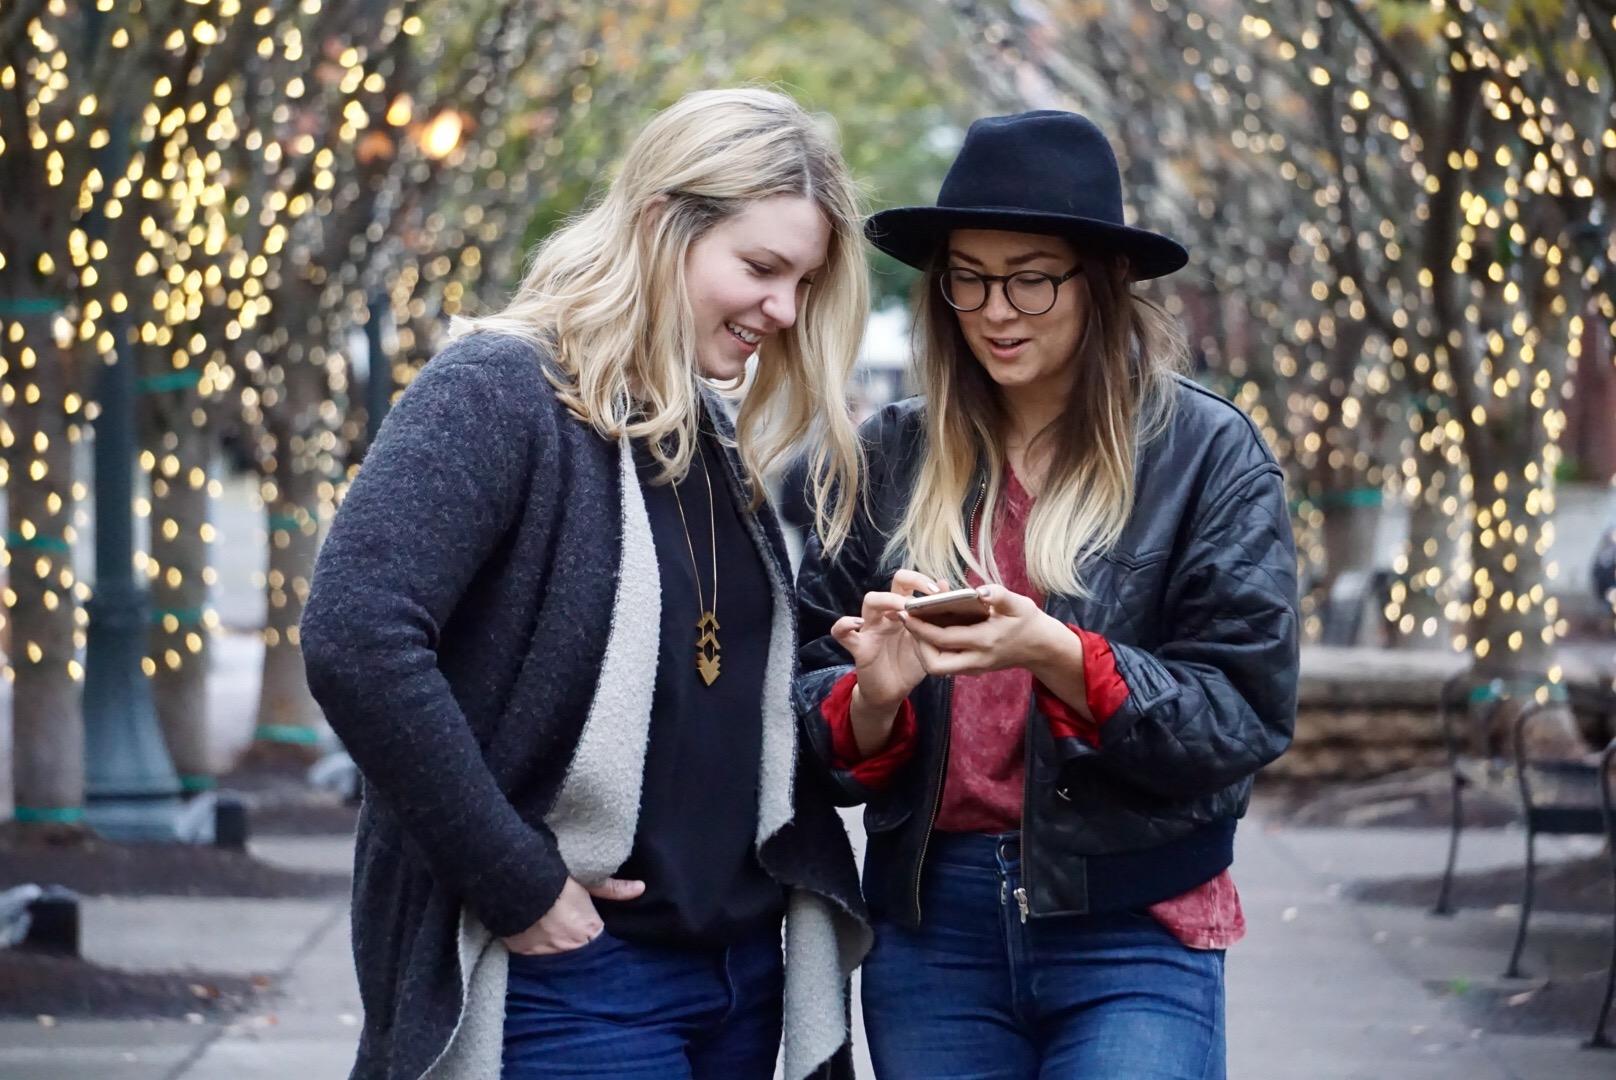 Portland social media manager strategist stylish retail